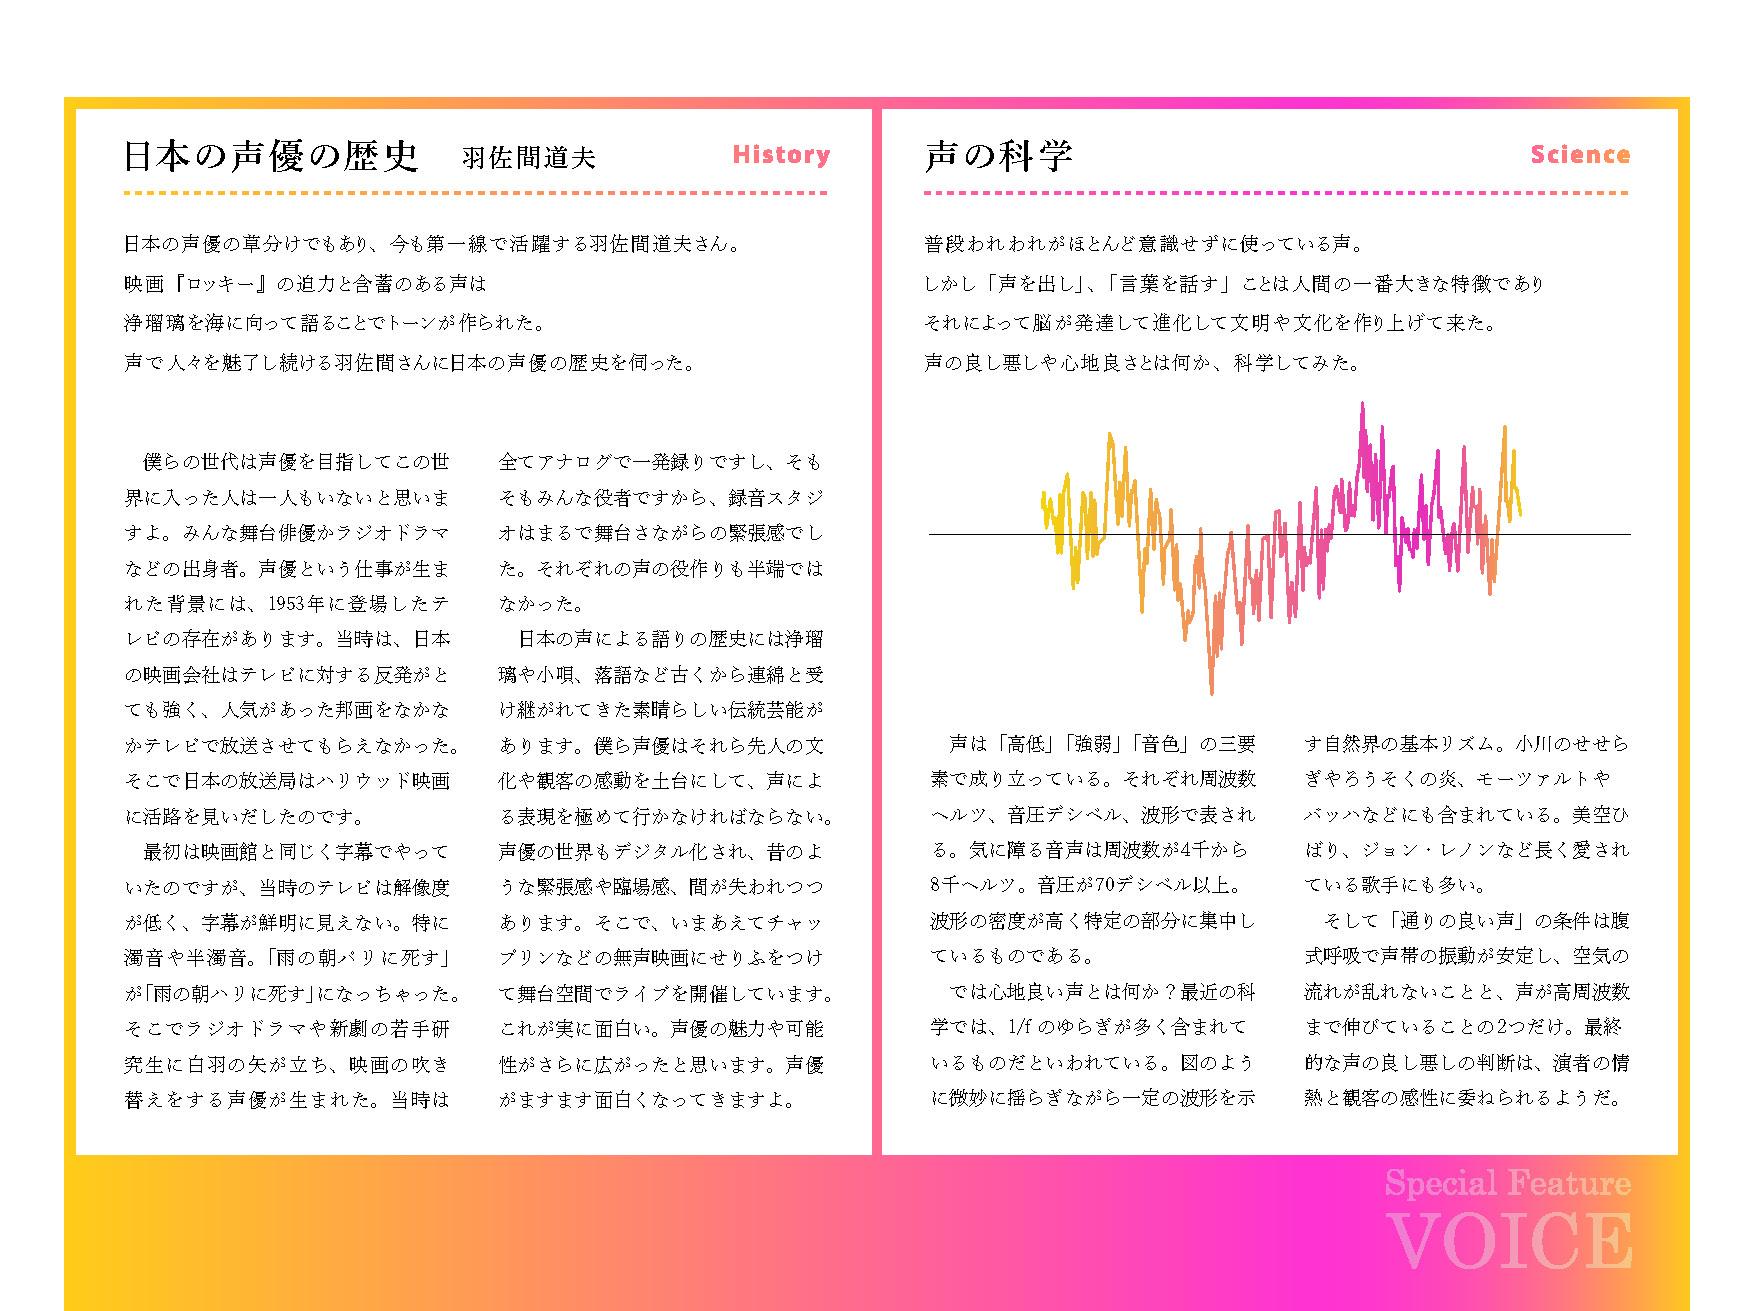 sanzui01_05.jpg